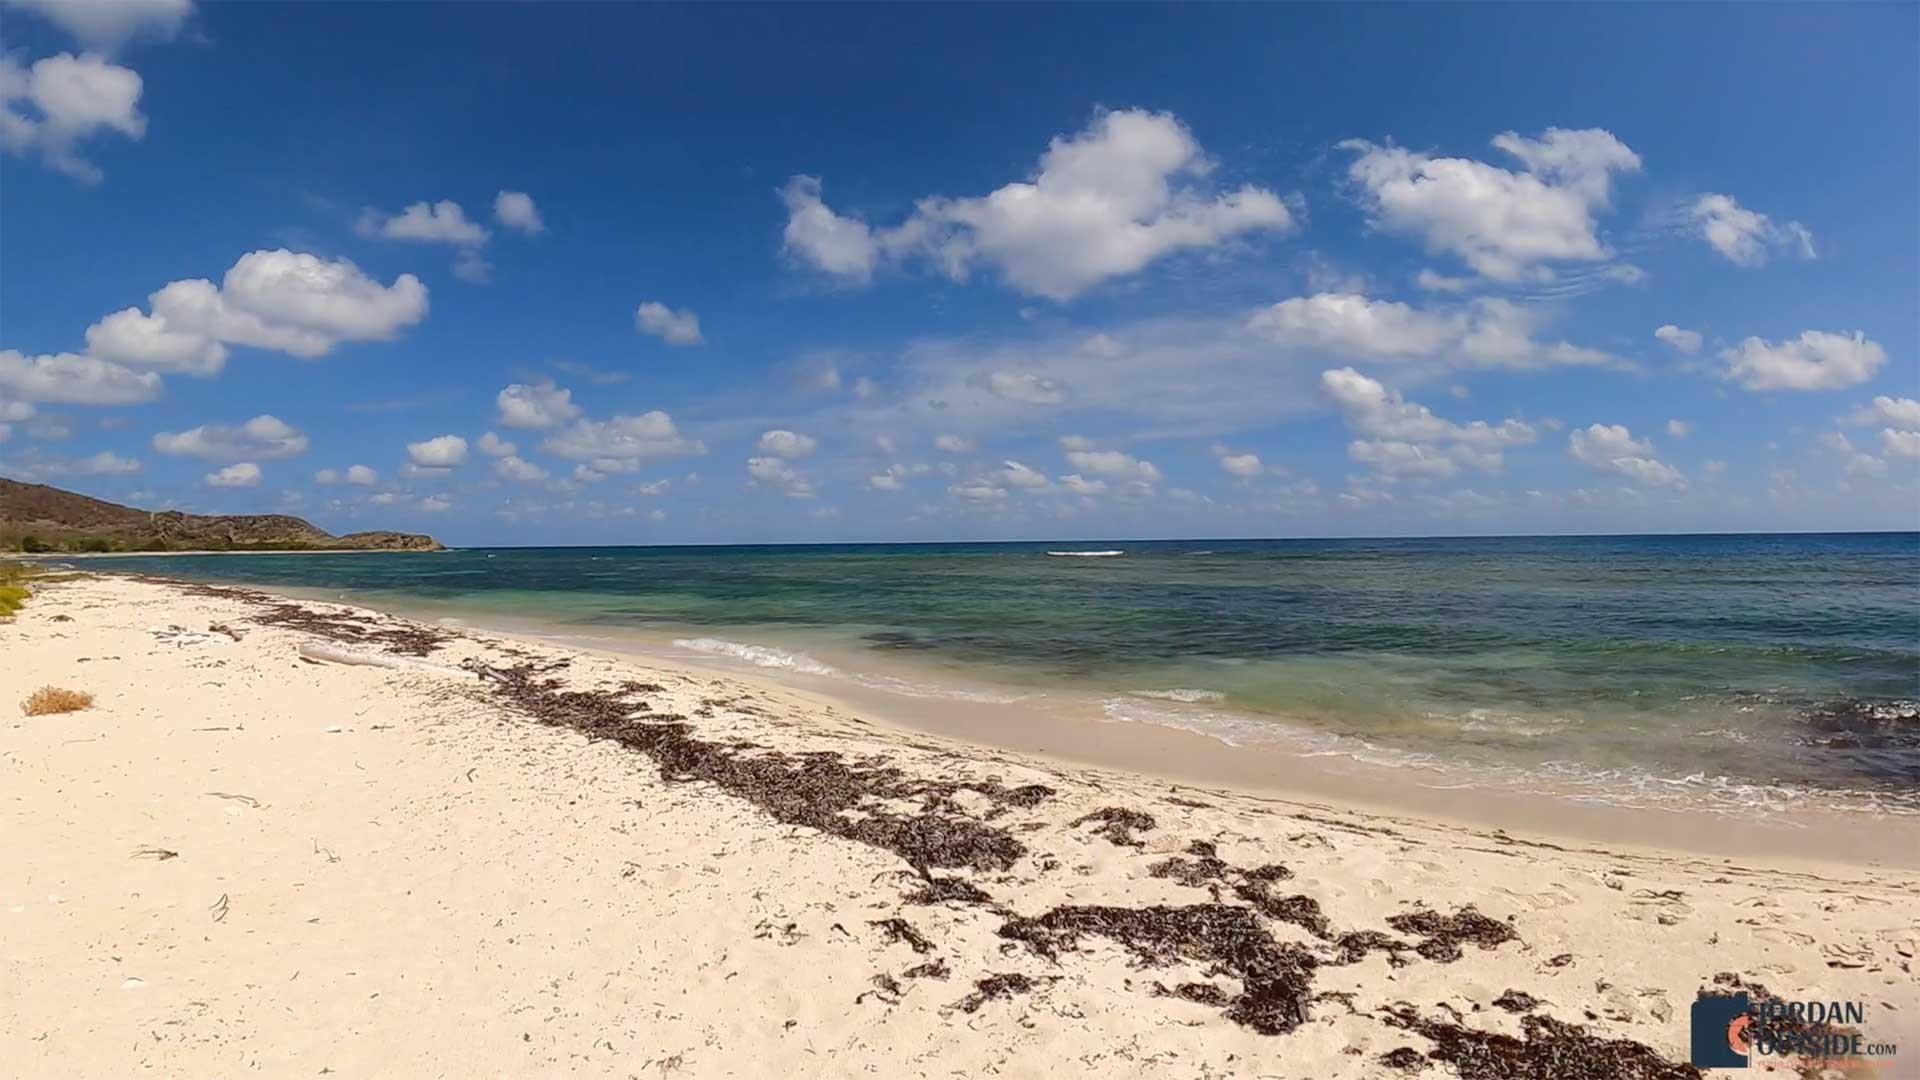 Beach view of Jack's Bay Beach, St. Croix